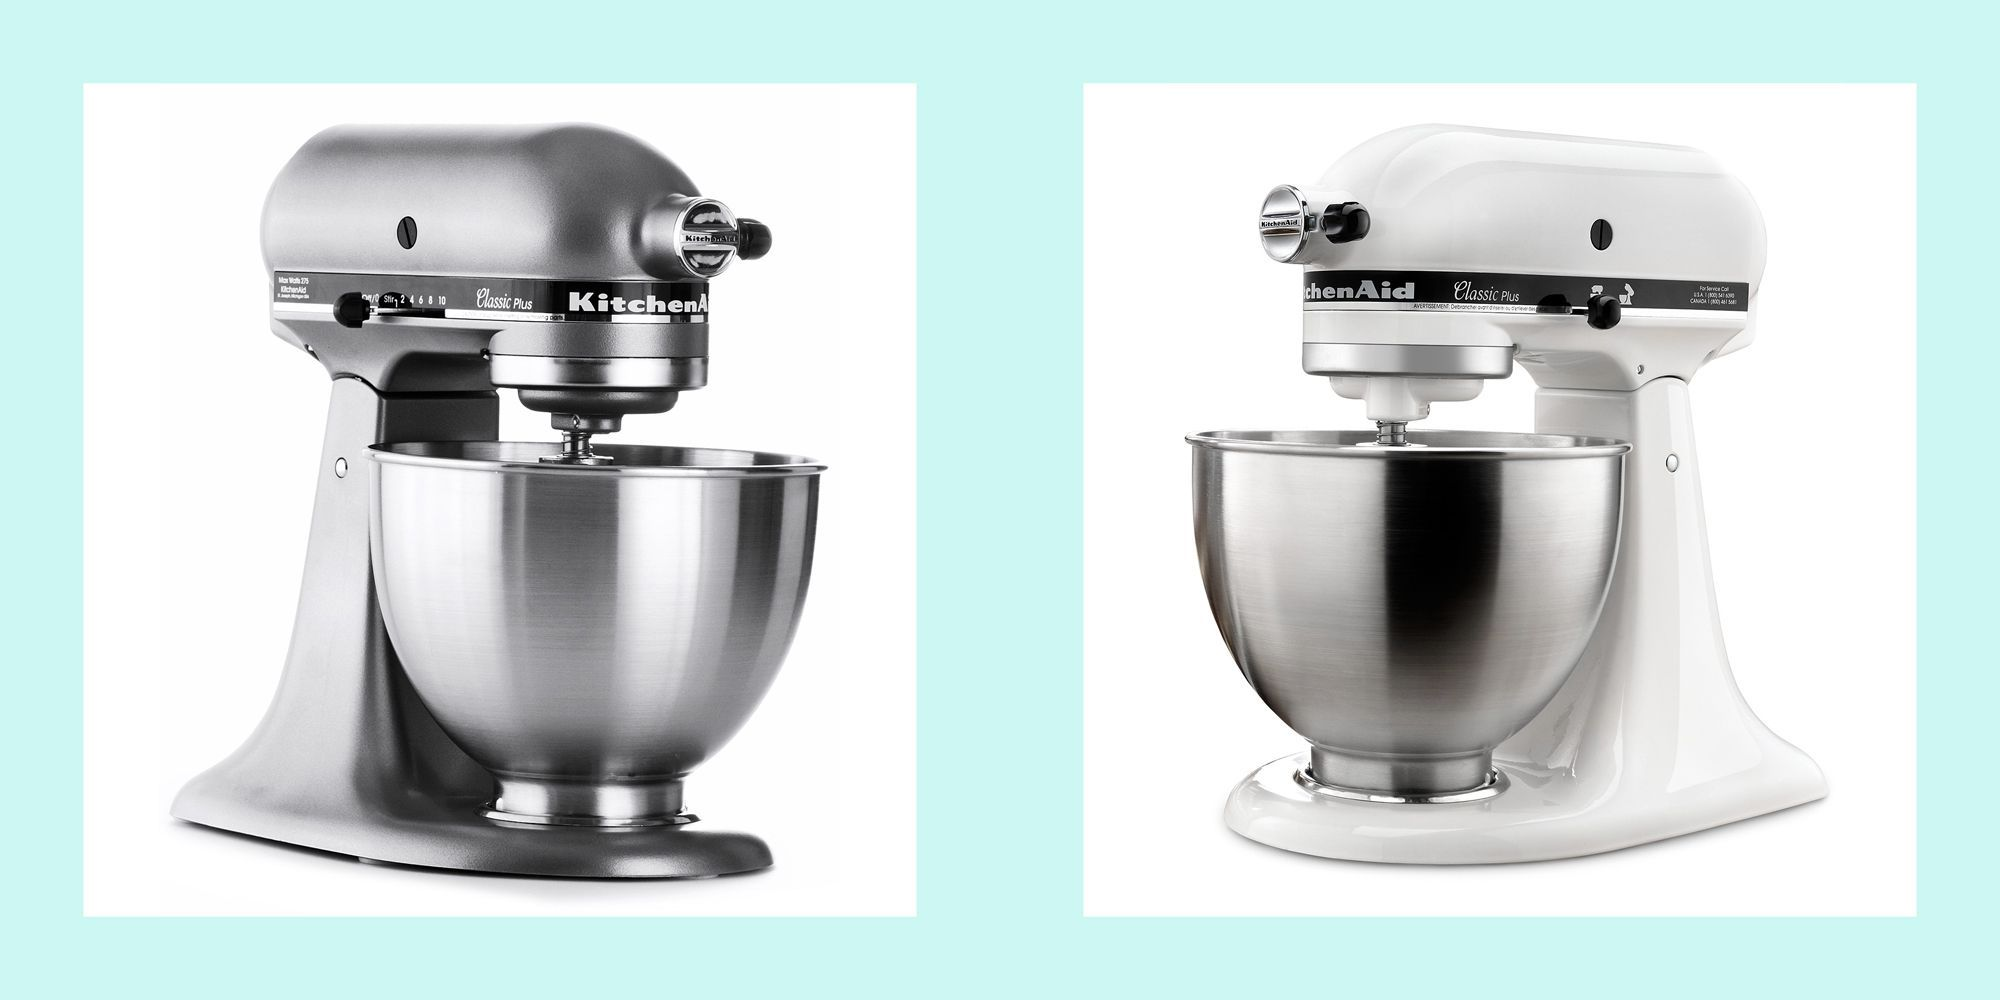 Kitchenaid Classic Plus 4 5 Quart Stand Mixer